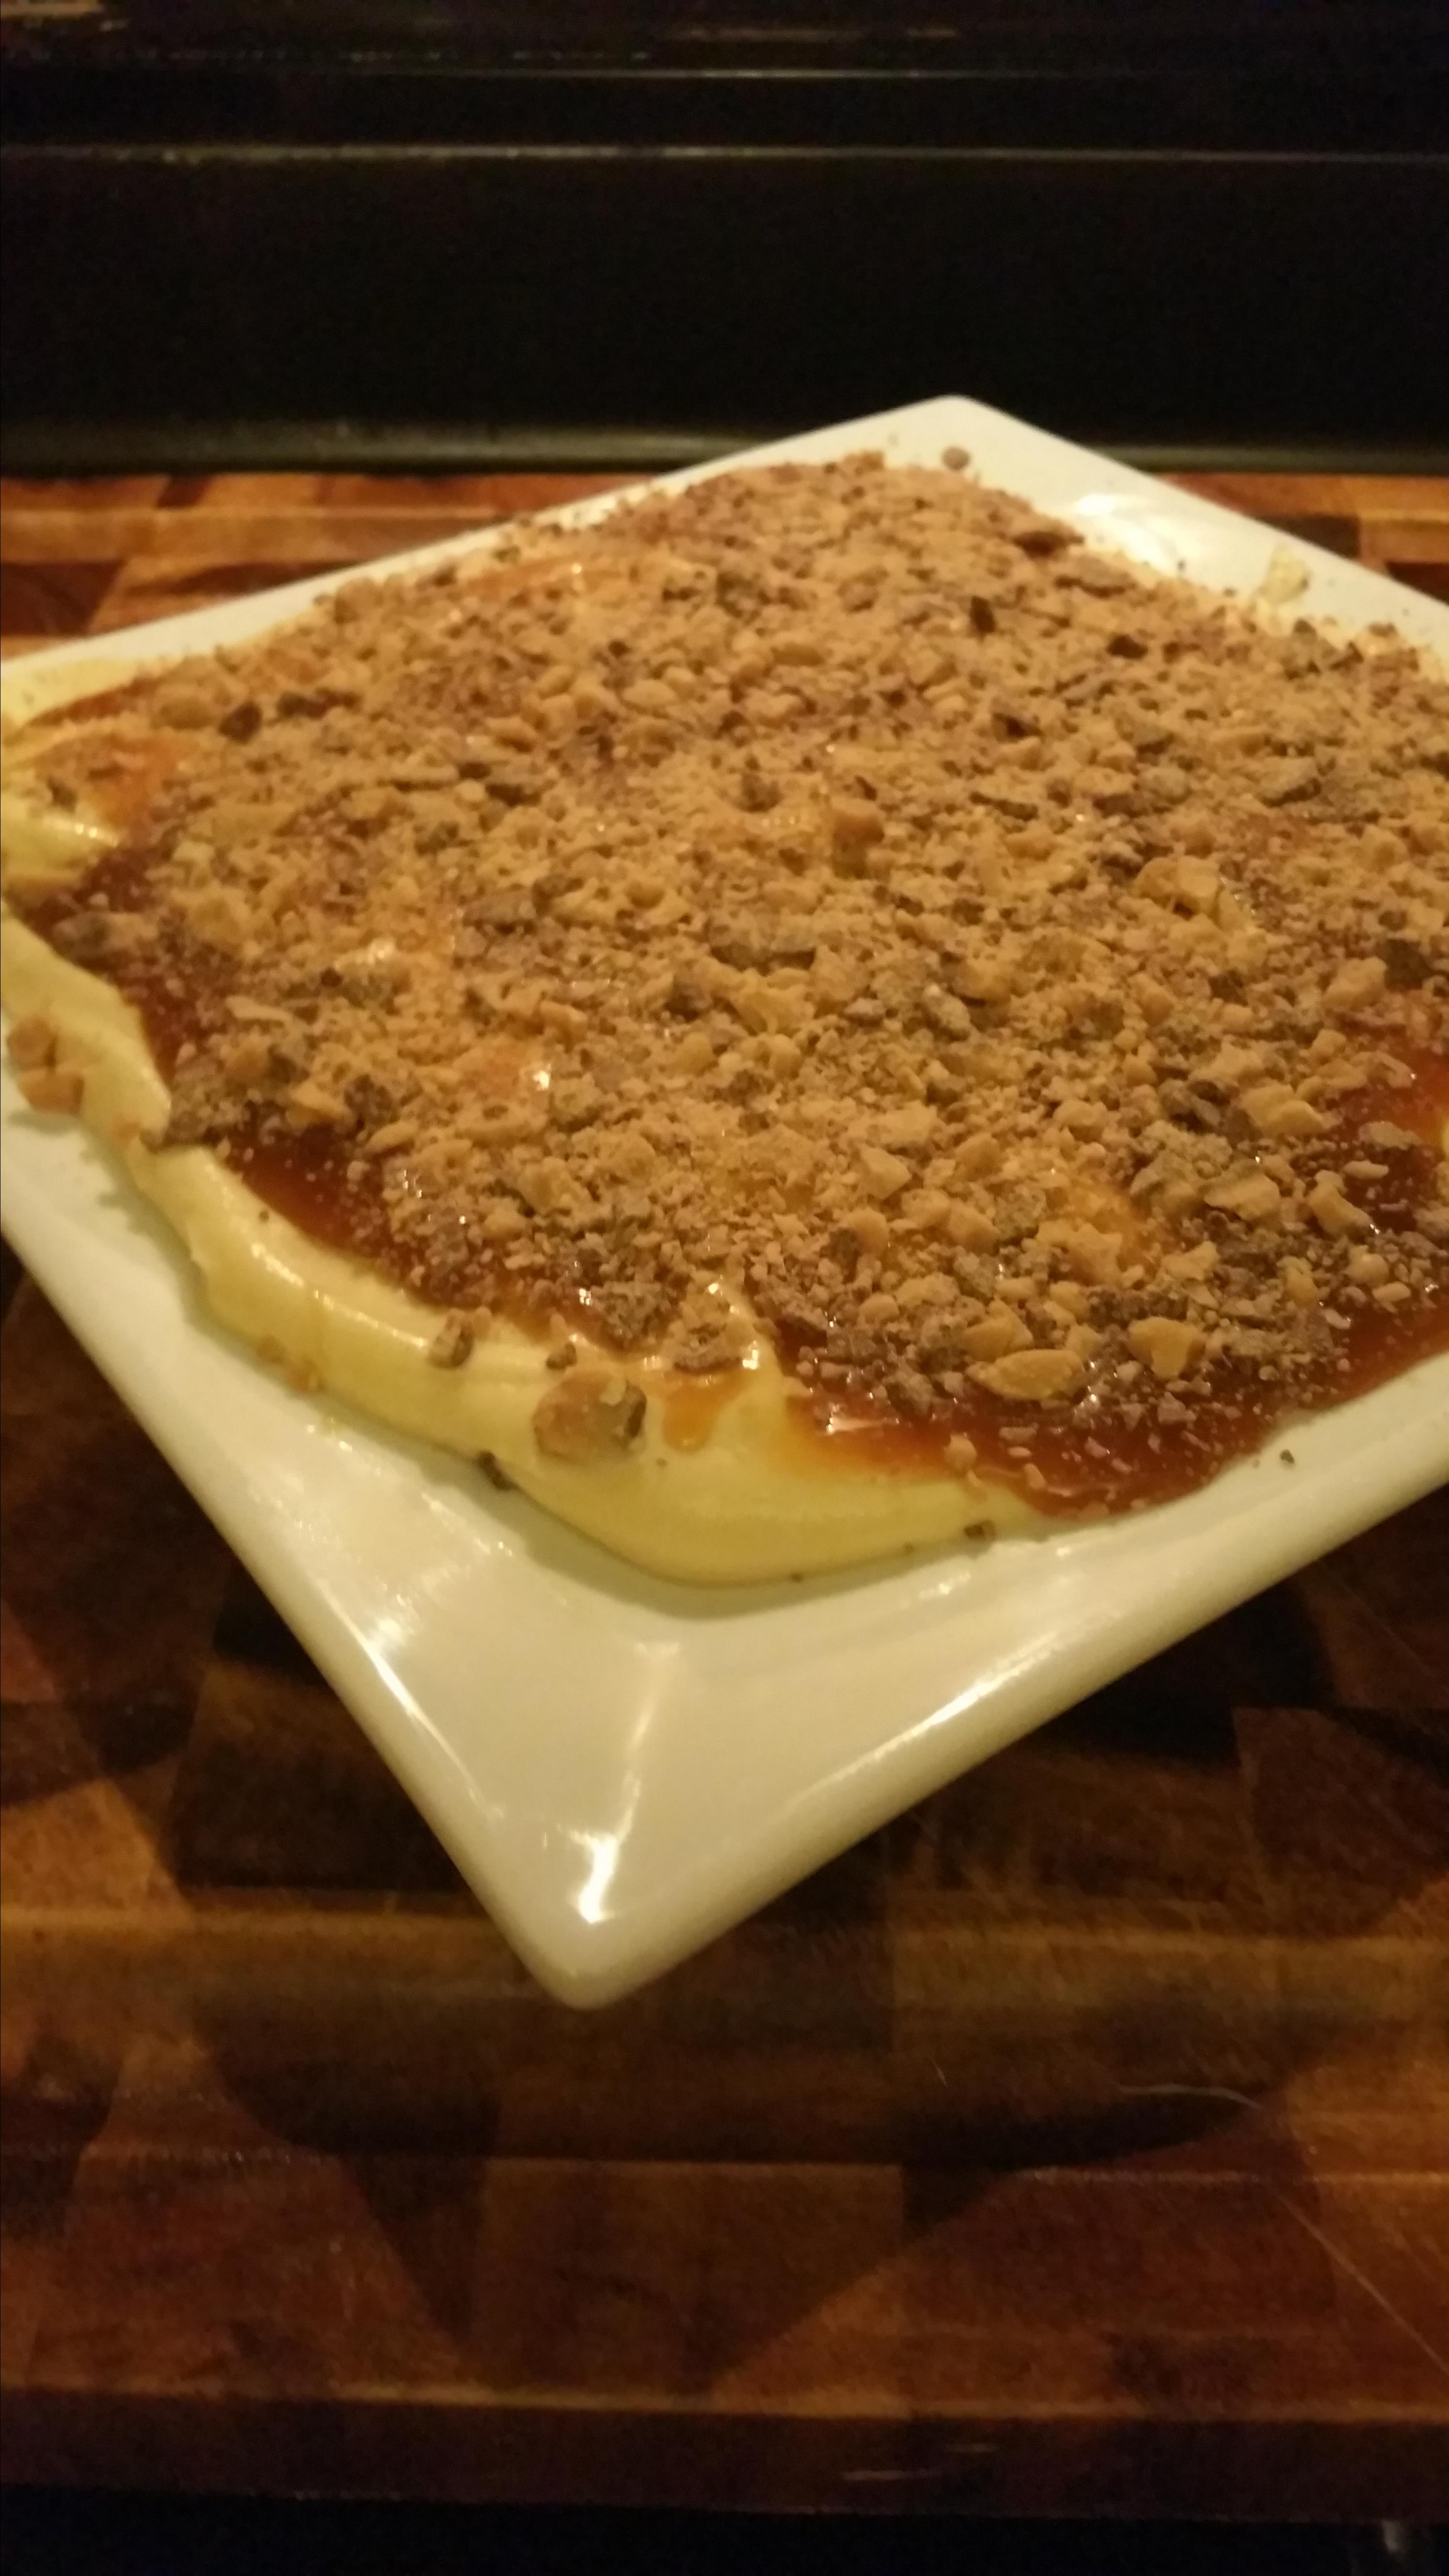 Heavenly 'Apple of My Thigh' Dessert Freebie